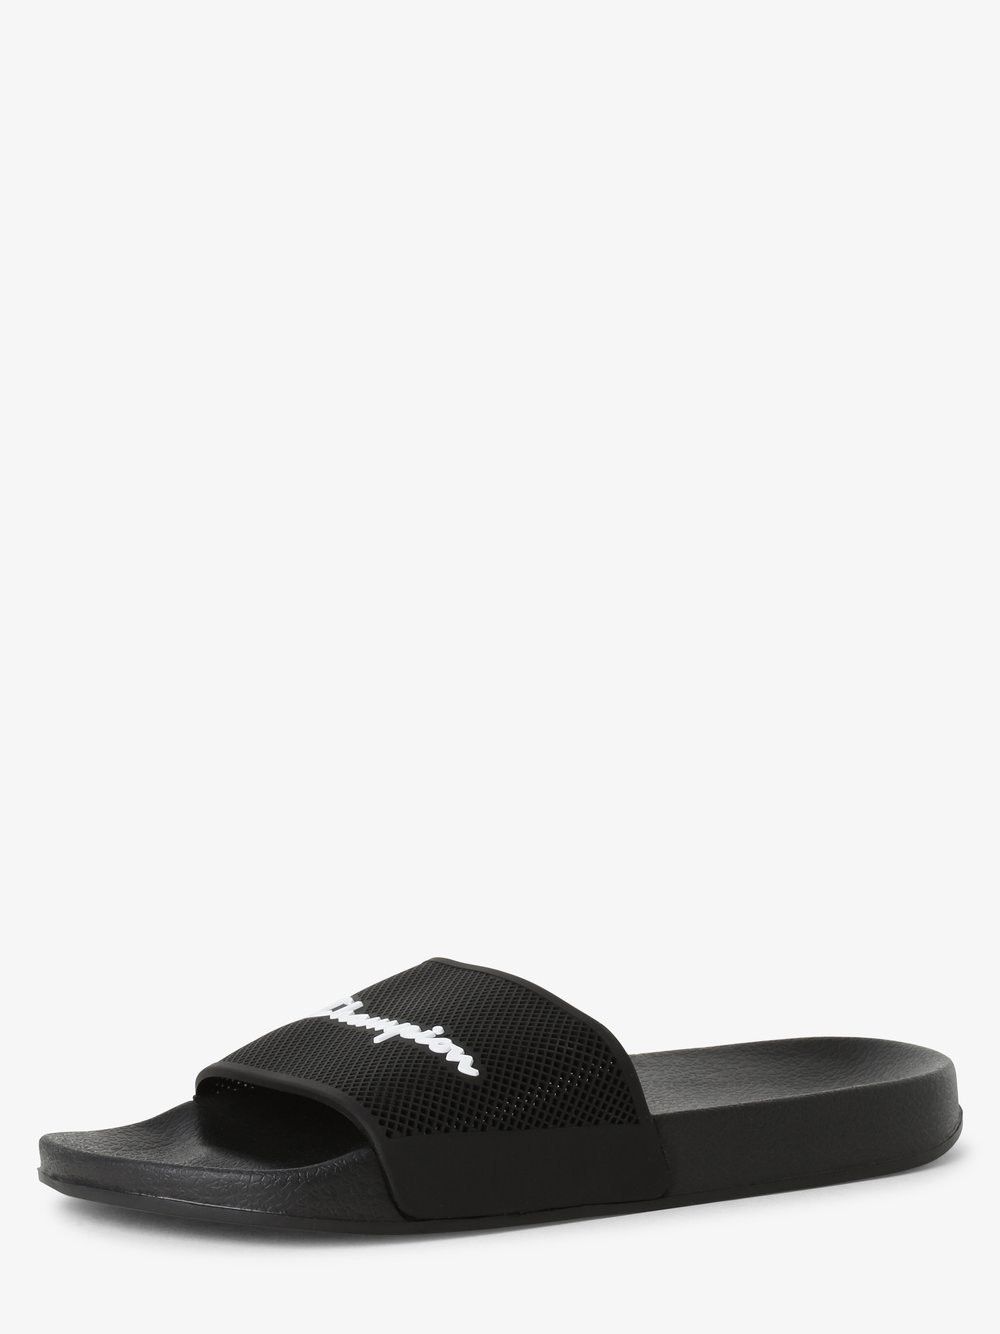 Champion - Męskie pantofle kąpielowe, czarny